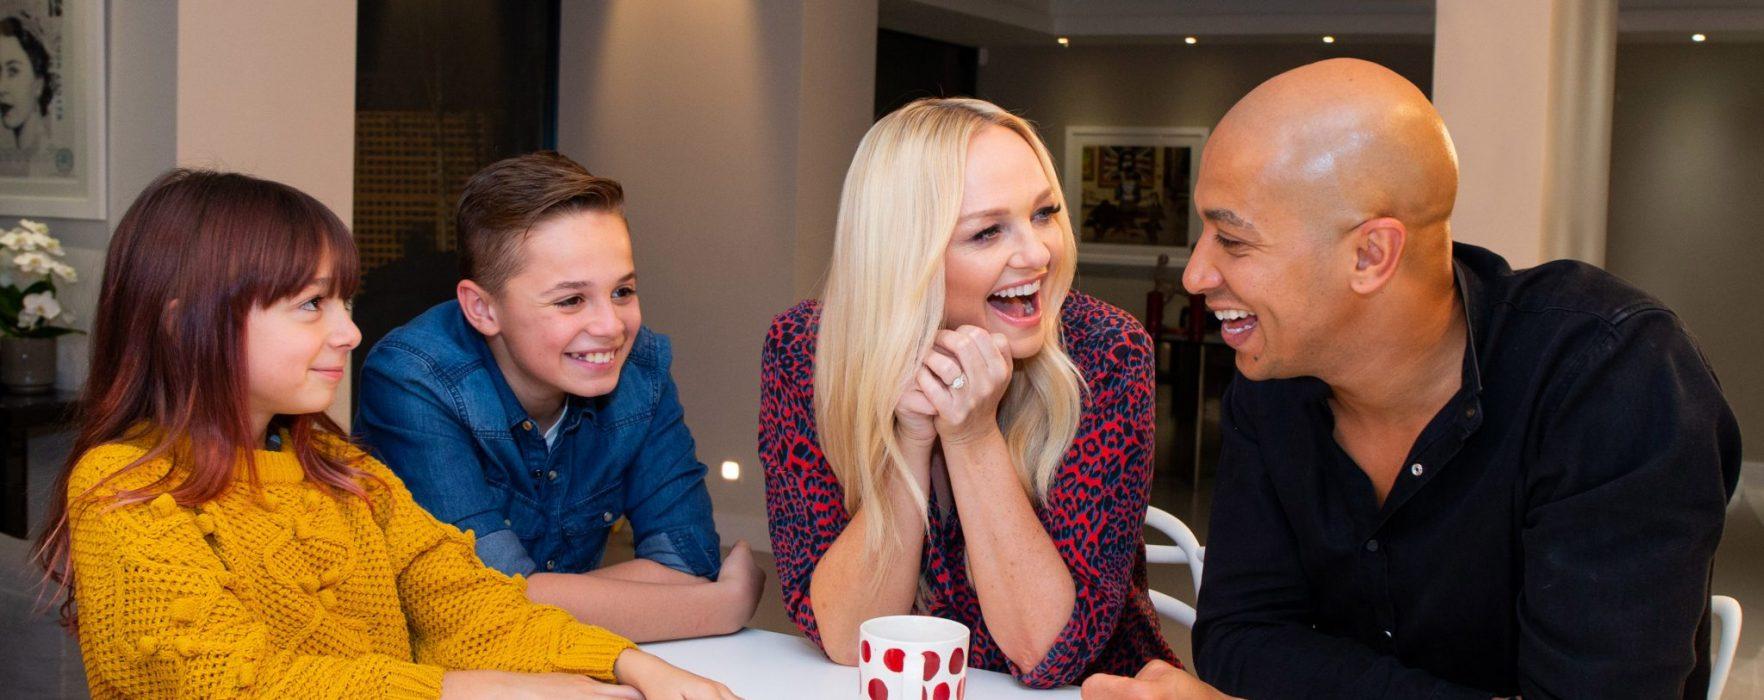 Emma Bunton shares her top tips to help families achieve a positive digital life balance